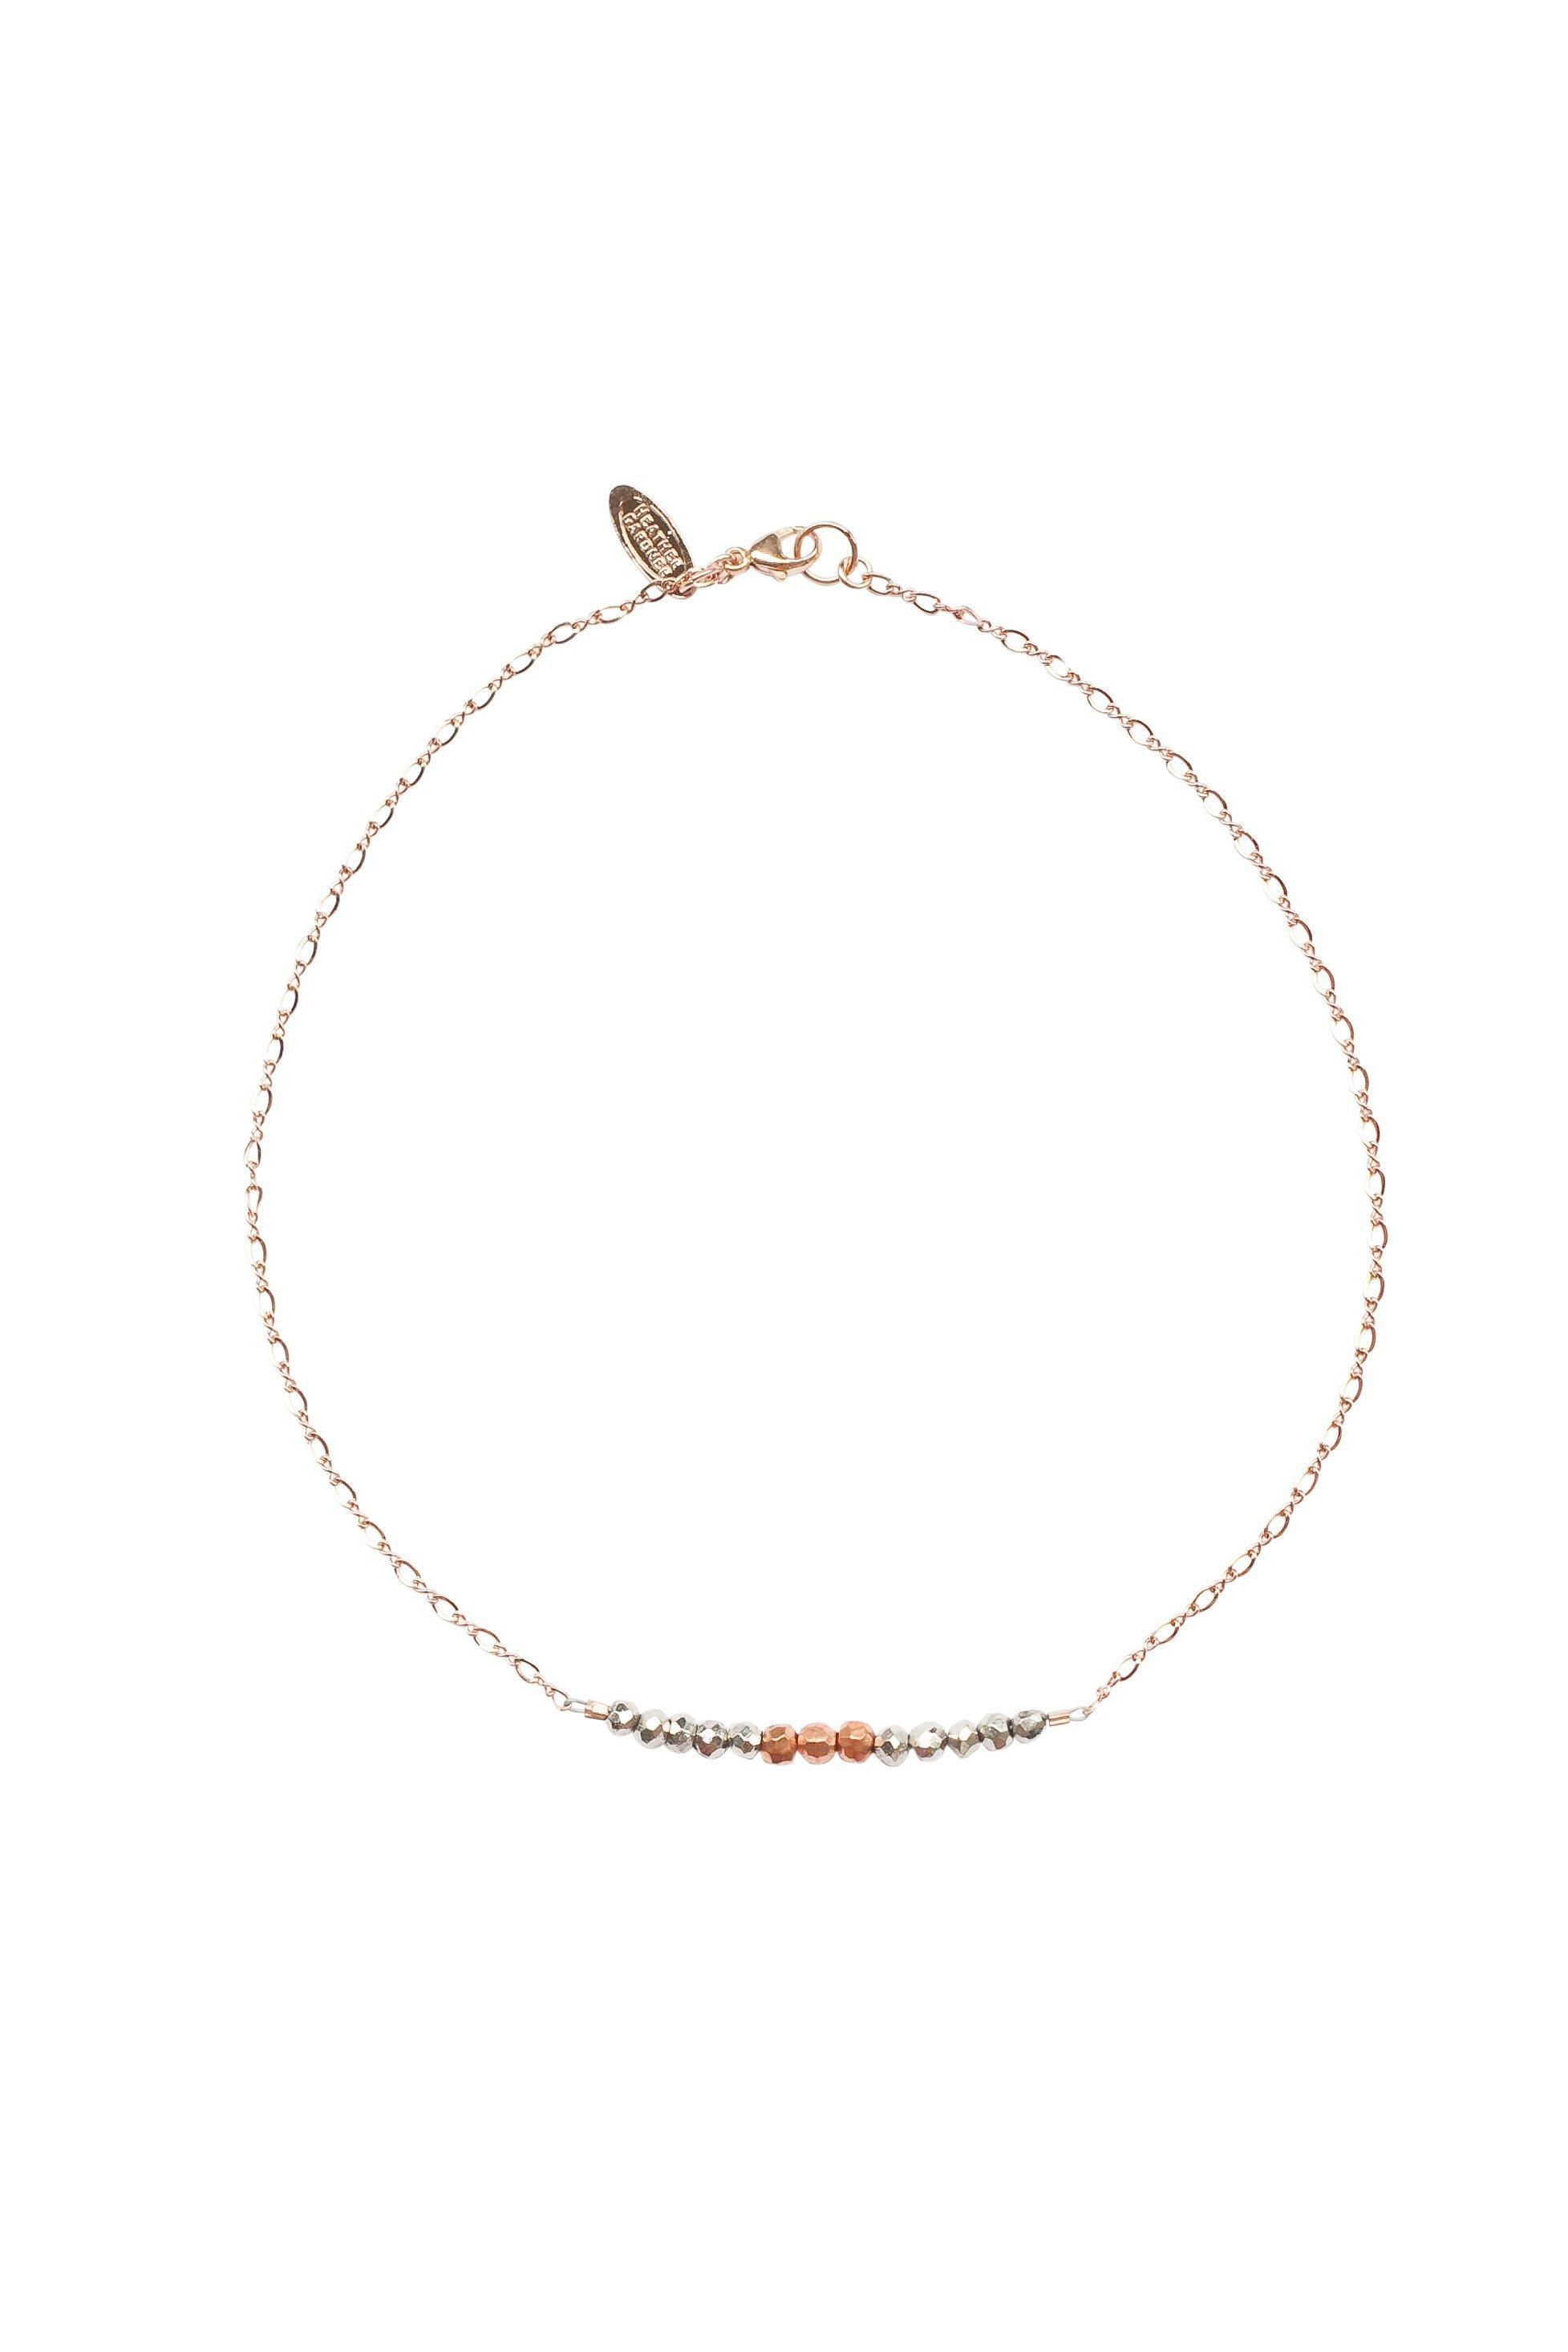 Heather Gardner - Mermaid Gemstone Kids Necklace in Rose Gold w/Gunmetal